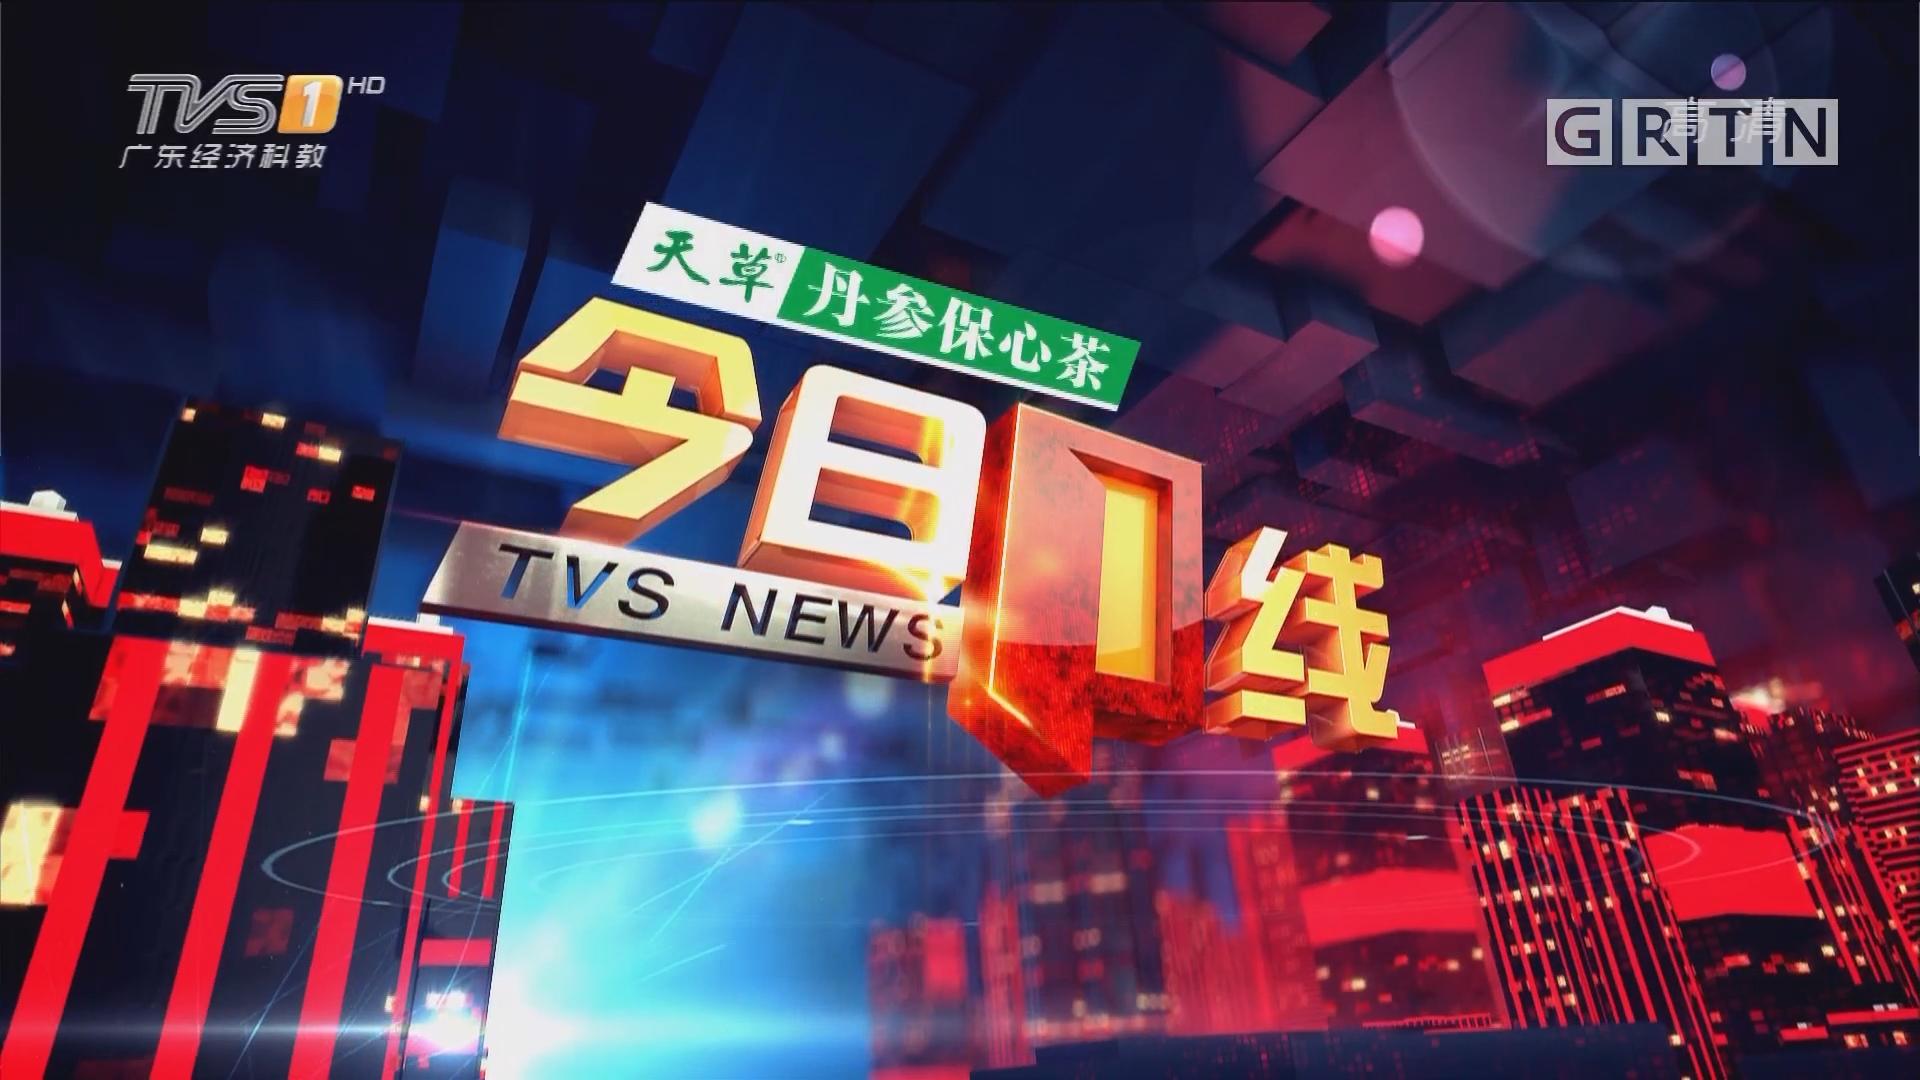 [HD][2017-12-31]今日一线:全省各地喜迎新年 惠州:西湖花灯博览会亮灯